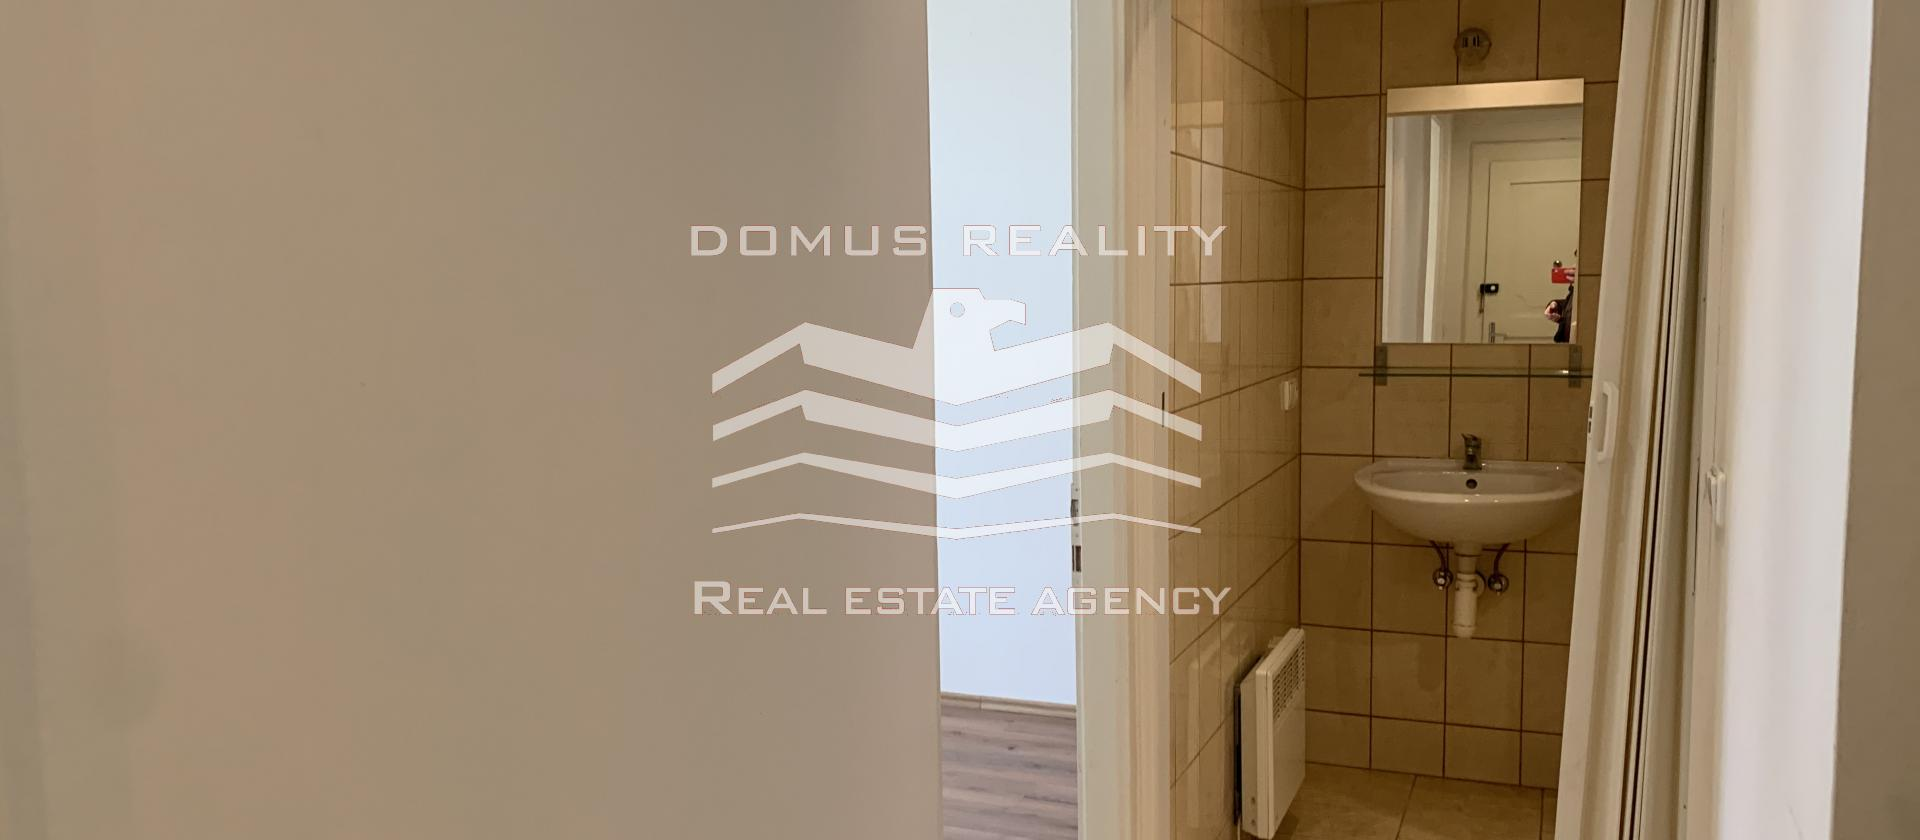 Pronájem bytu 2+kk 50 m²